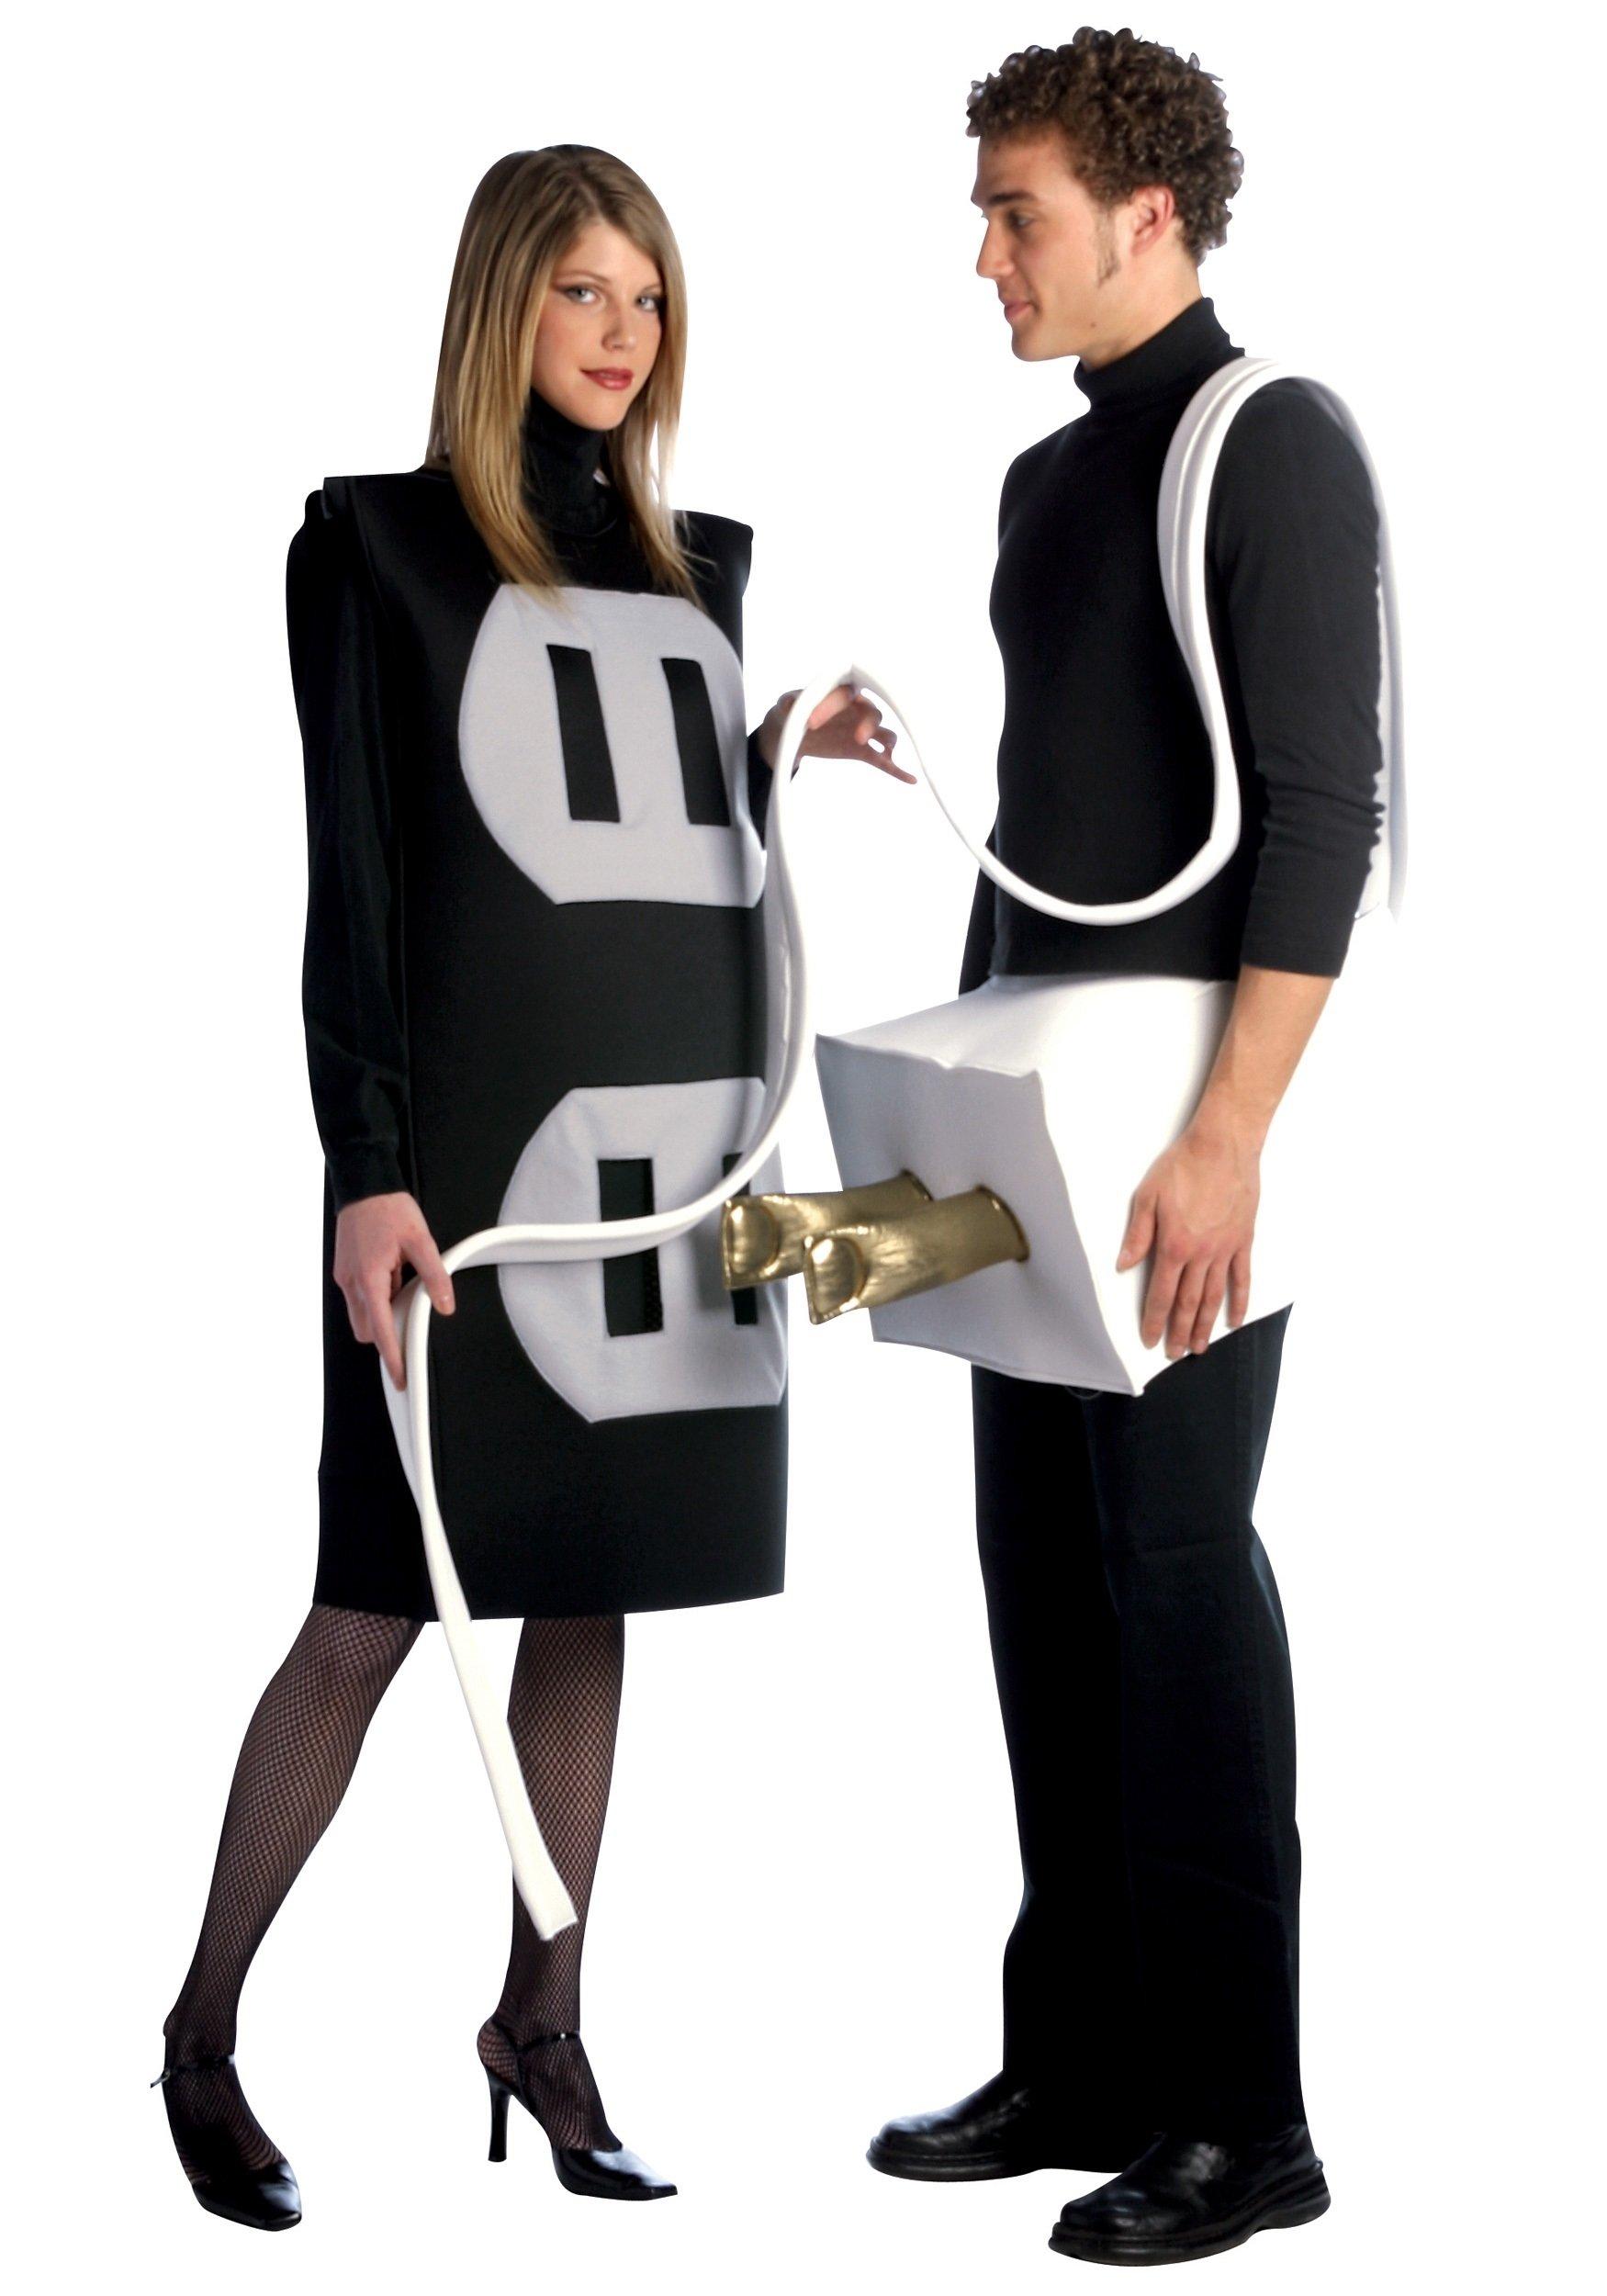 plug and socket costume - funny couples costume ideas